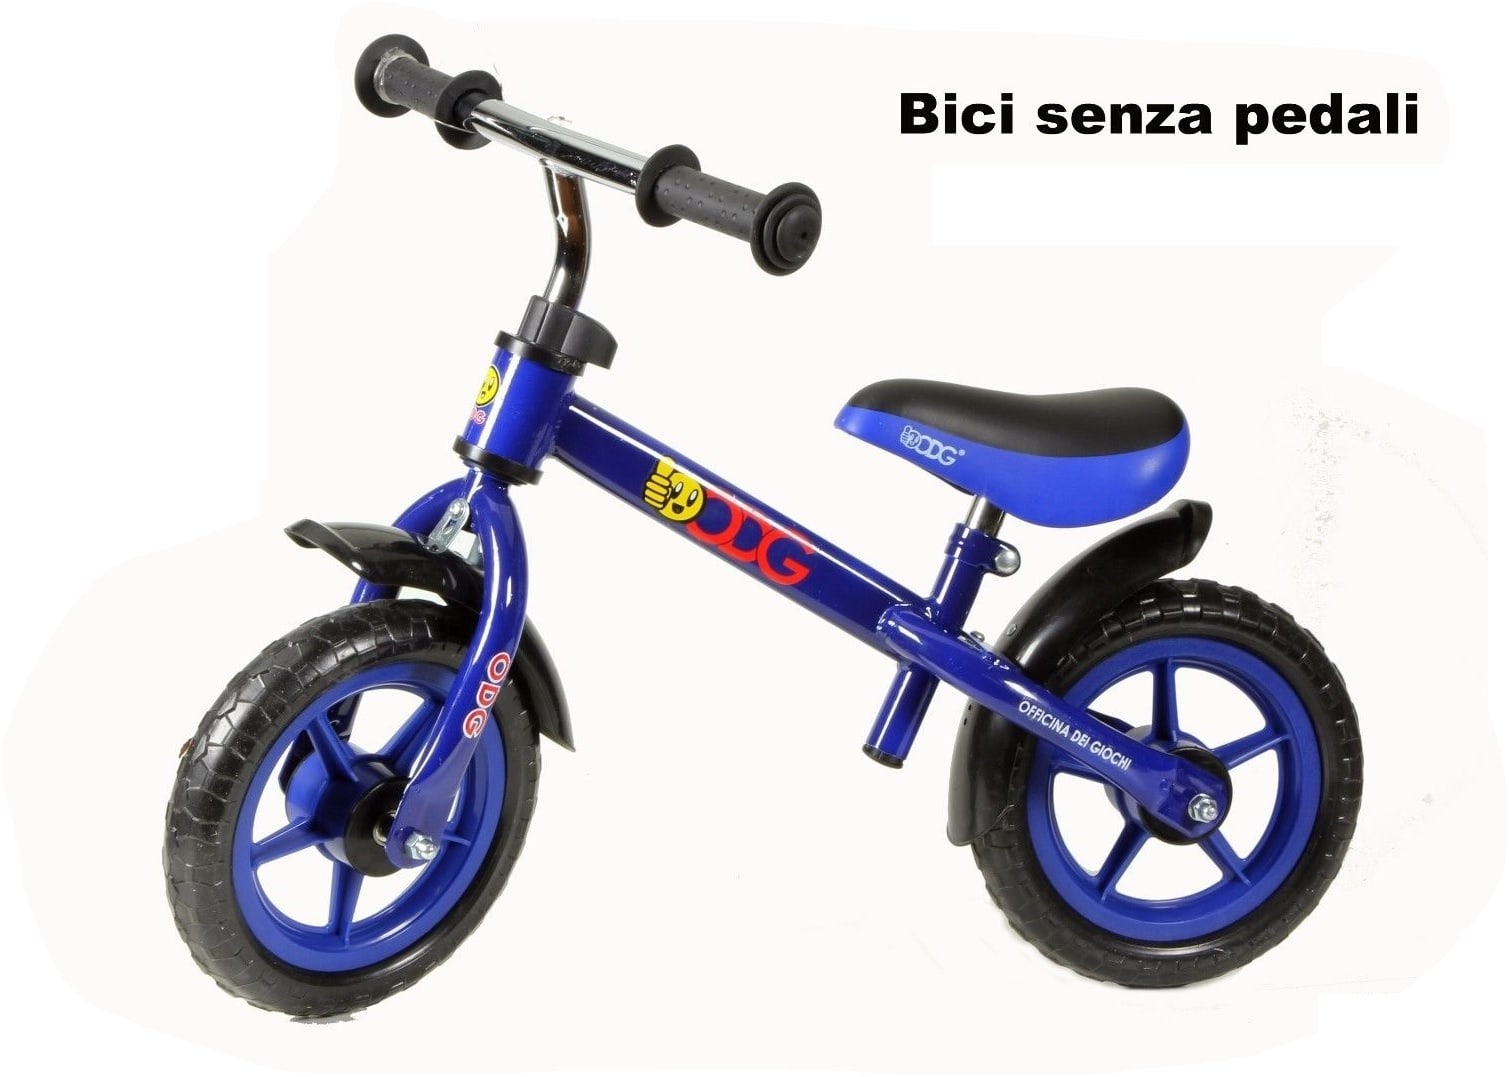 Bici Bicicletta Senza Pedali Pedagogica Lgv Shopping